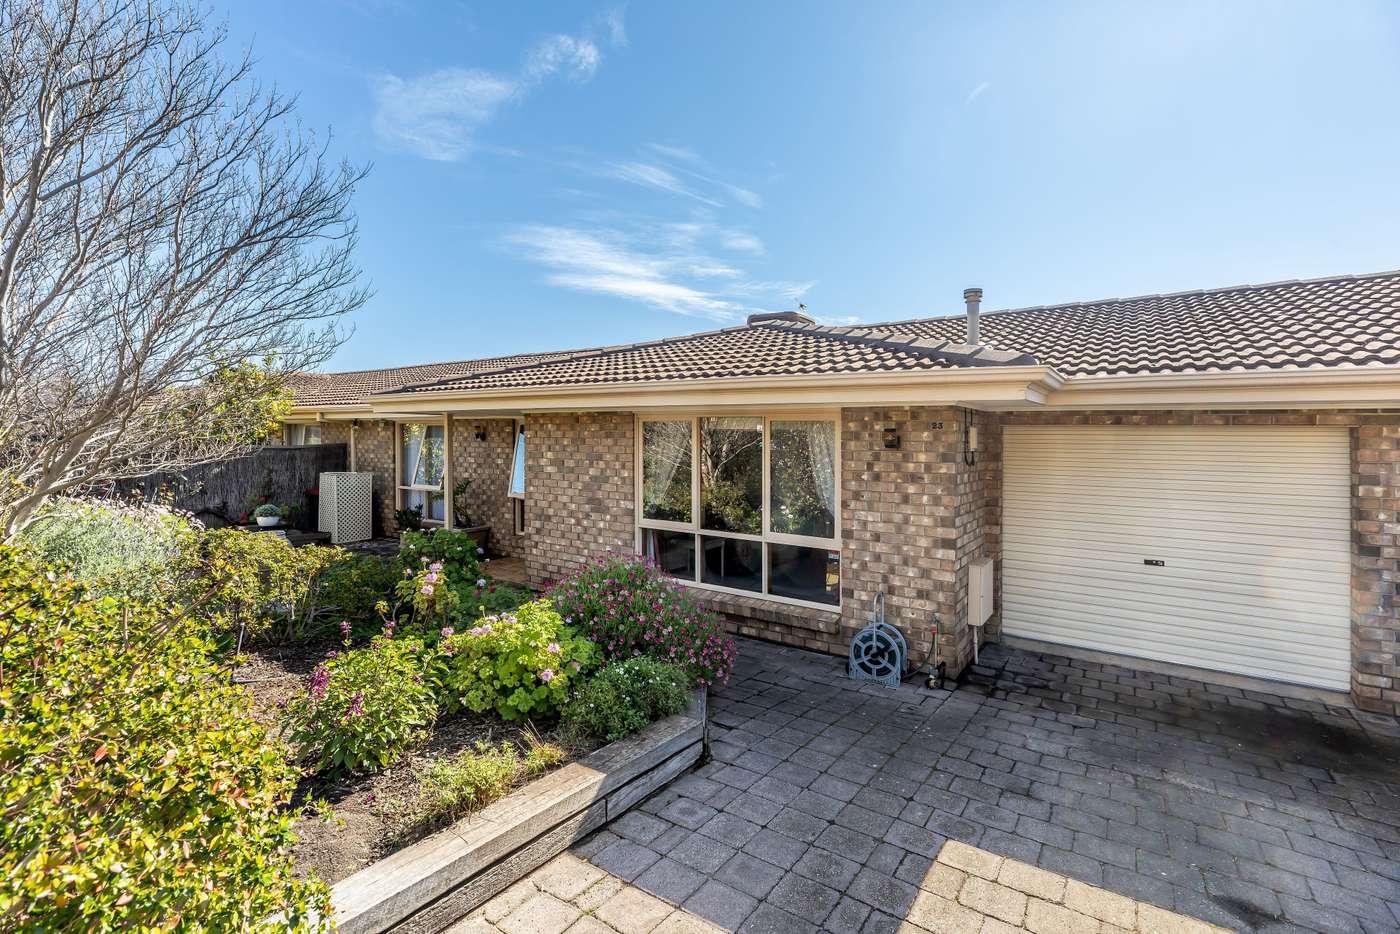 Main view of Homely house listing, 2/23 Bandon Terrace, Kingston Park SA 5049